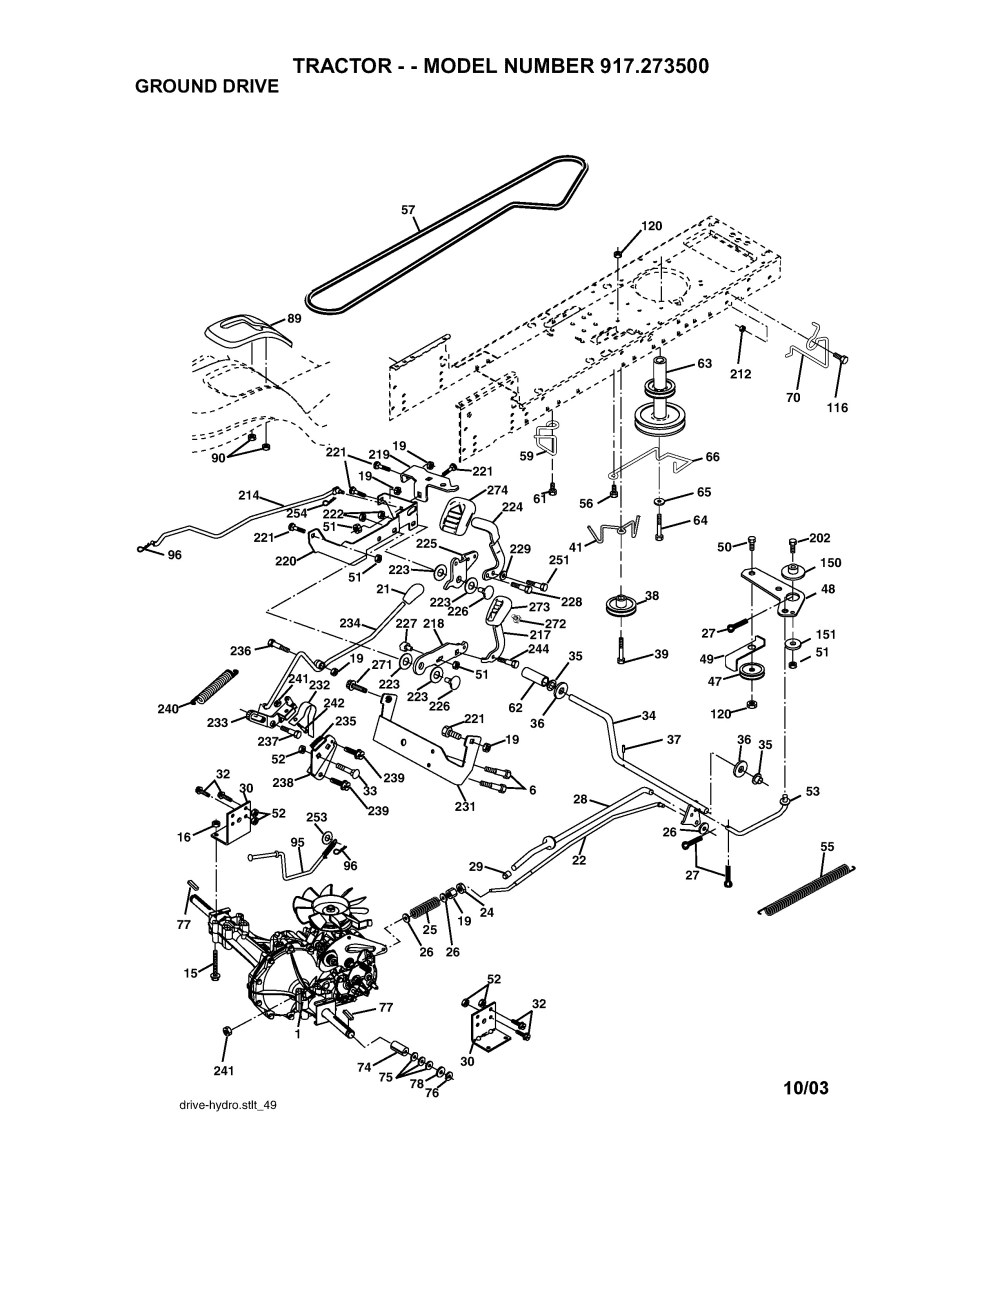 medium resolution of gt5000 wiring diagram wiring diagram blogs rh 2 2 restaurant freinsheimer hof de craftsman gt5000 belt diagram craftsman wiring schematic